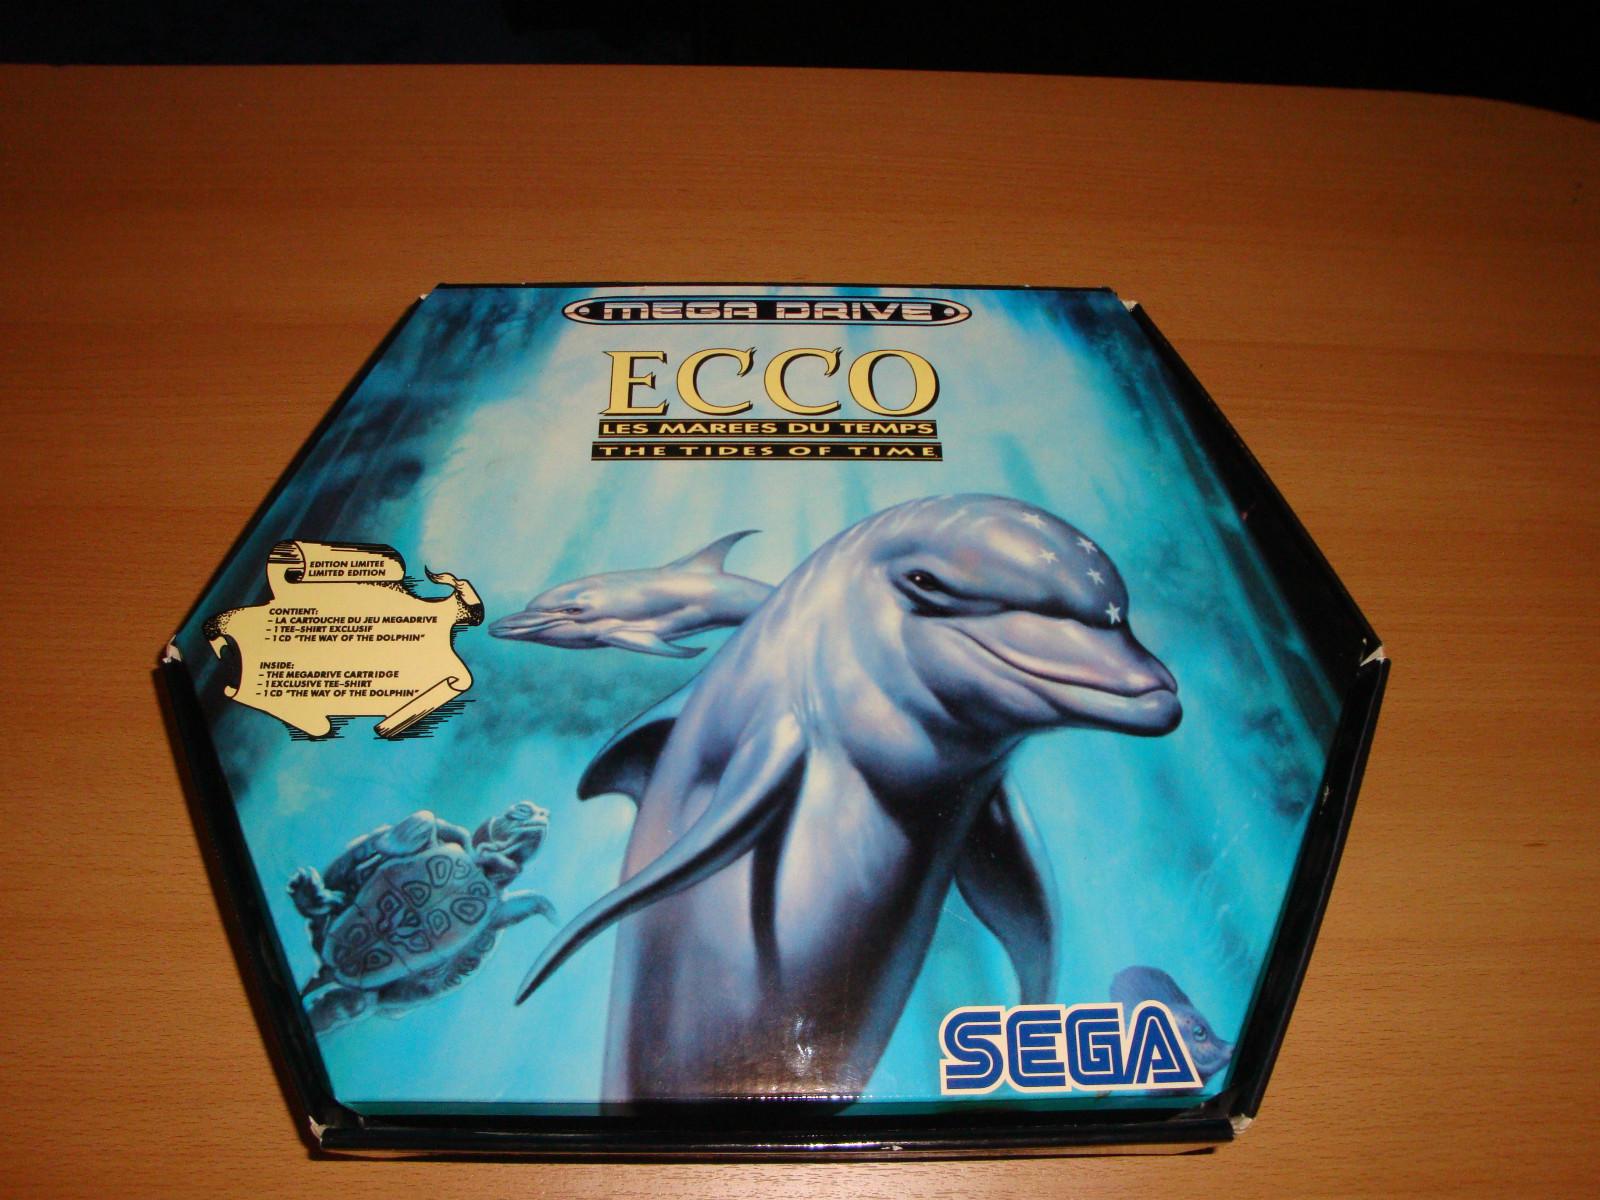 Sega Genesis / Megadrive Ecco The Dolphin Box Set (Photos